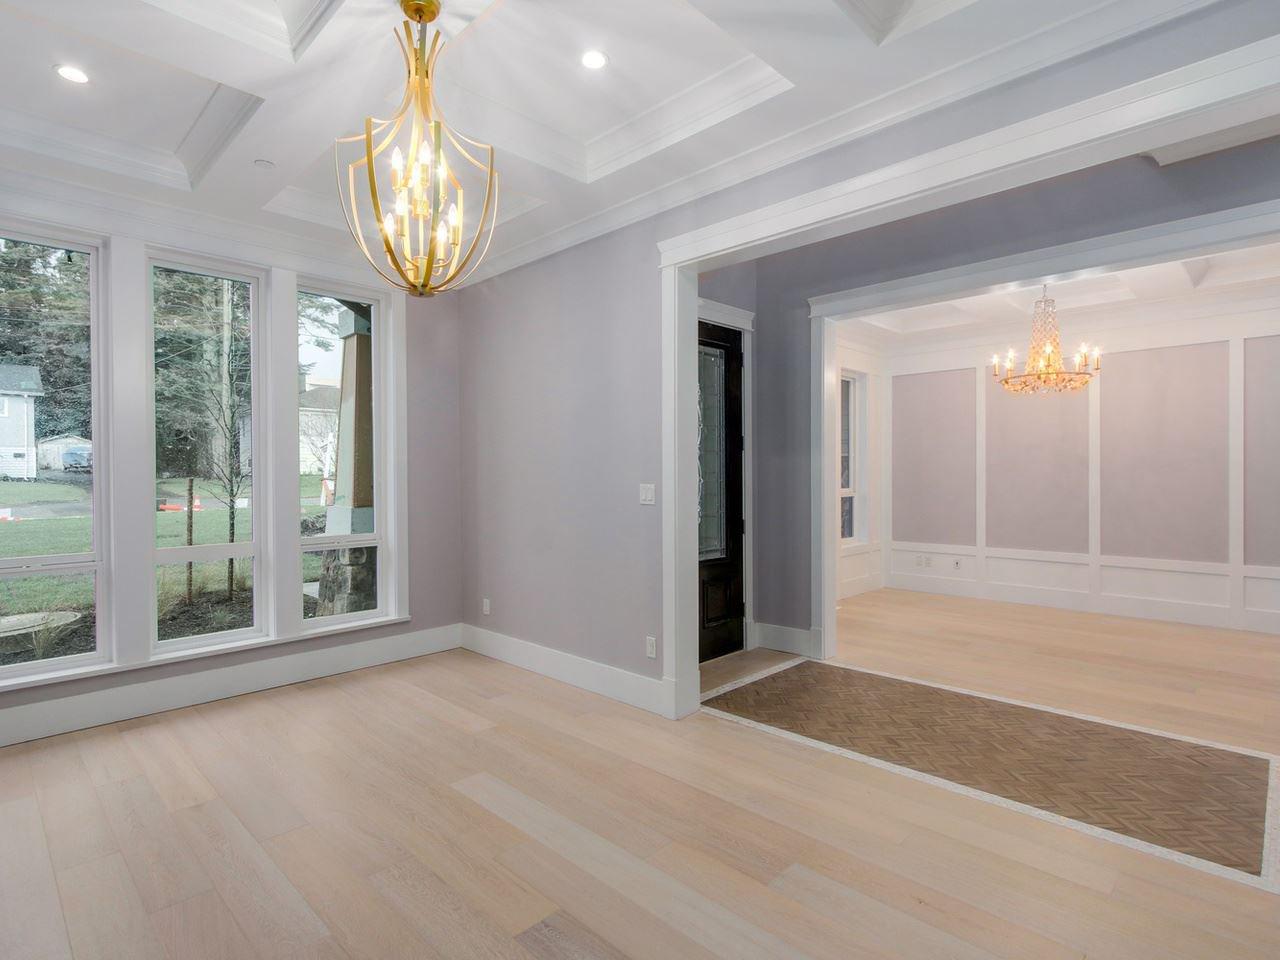 Photo 3: Photos: 1560 MAPLE Street: White Rock House for sale (South Surrey White Rock)  : MLS®# R2138926